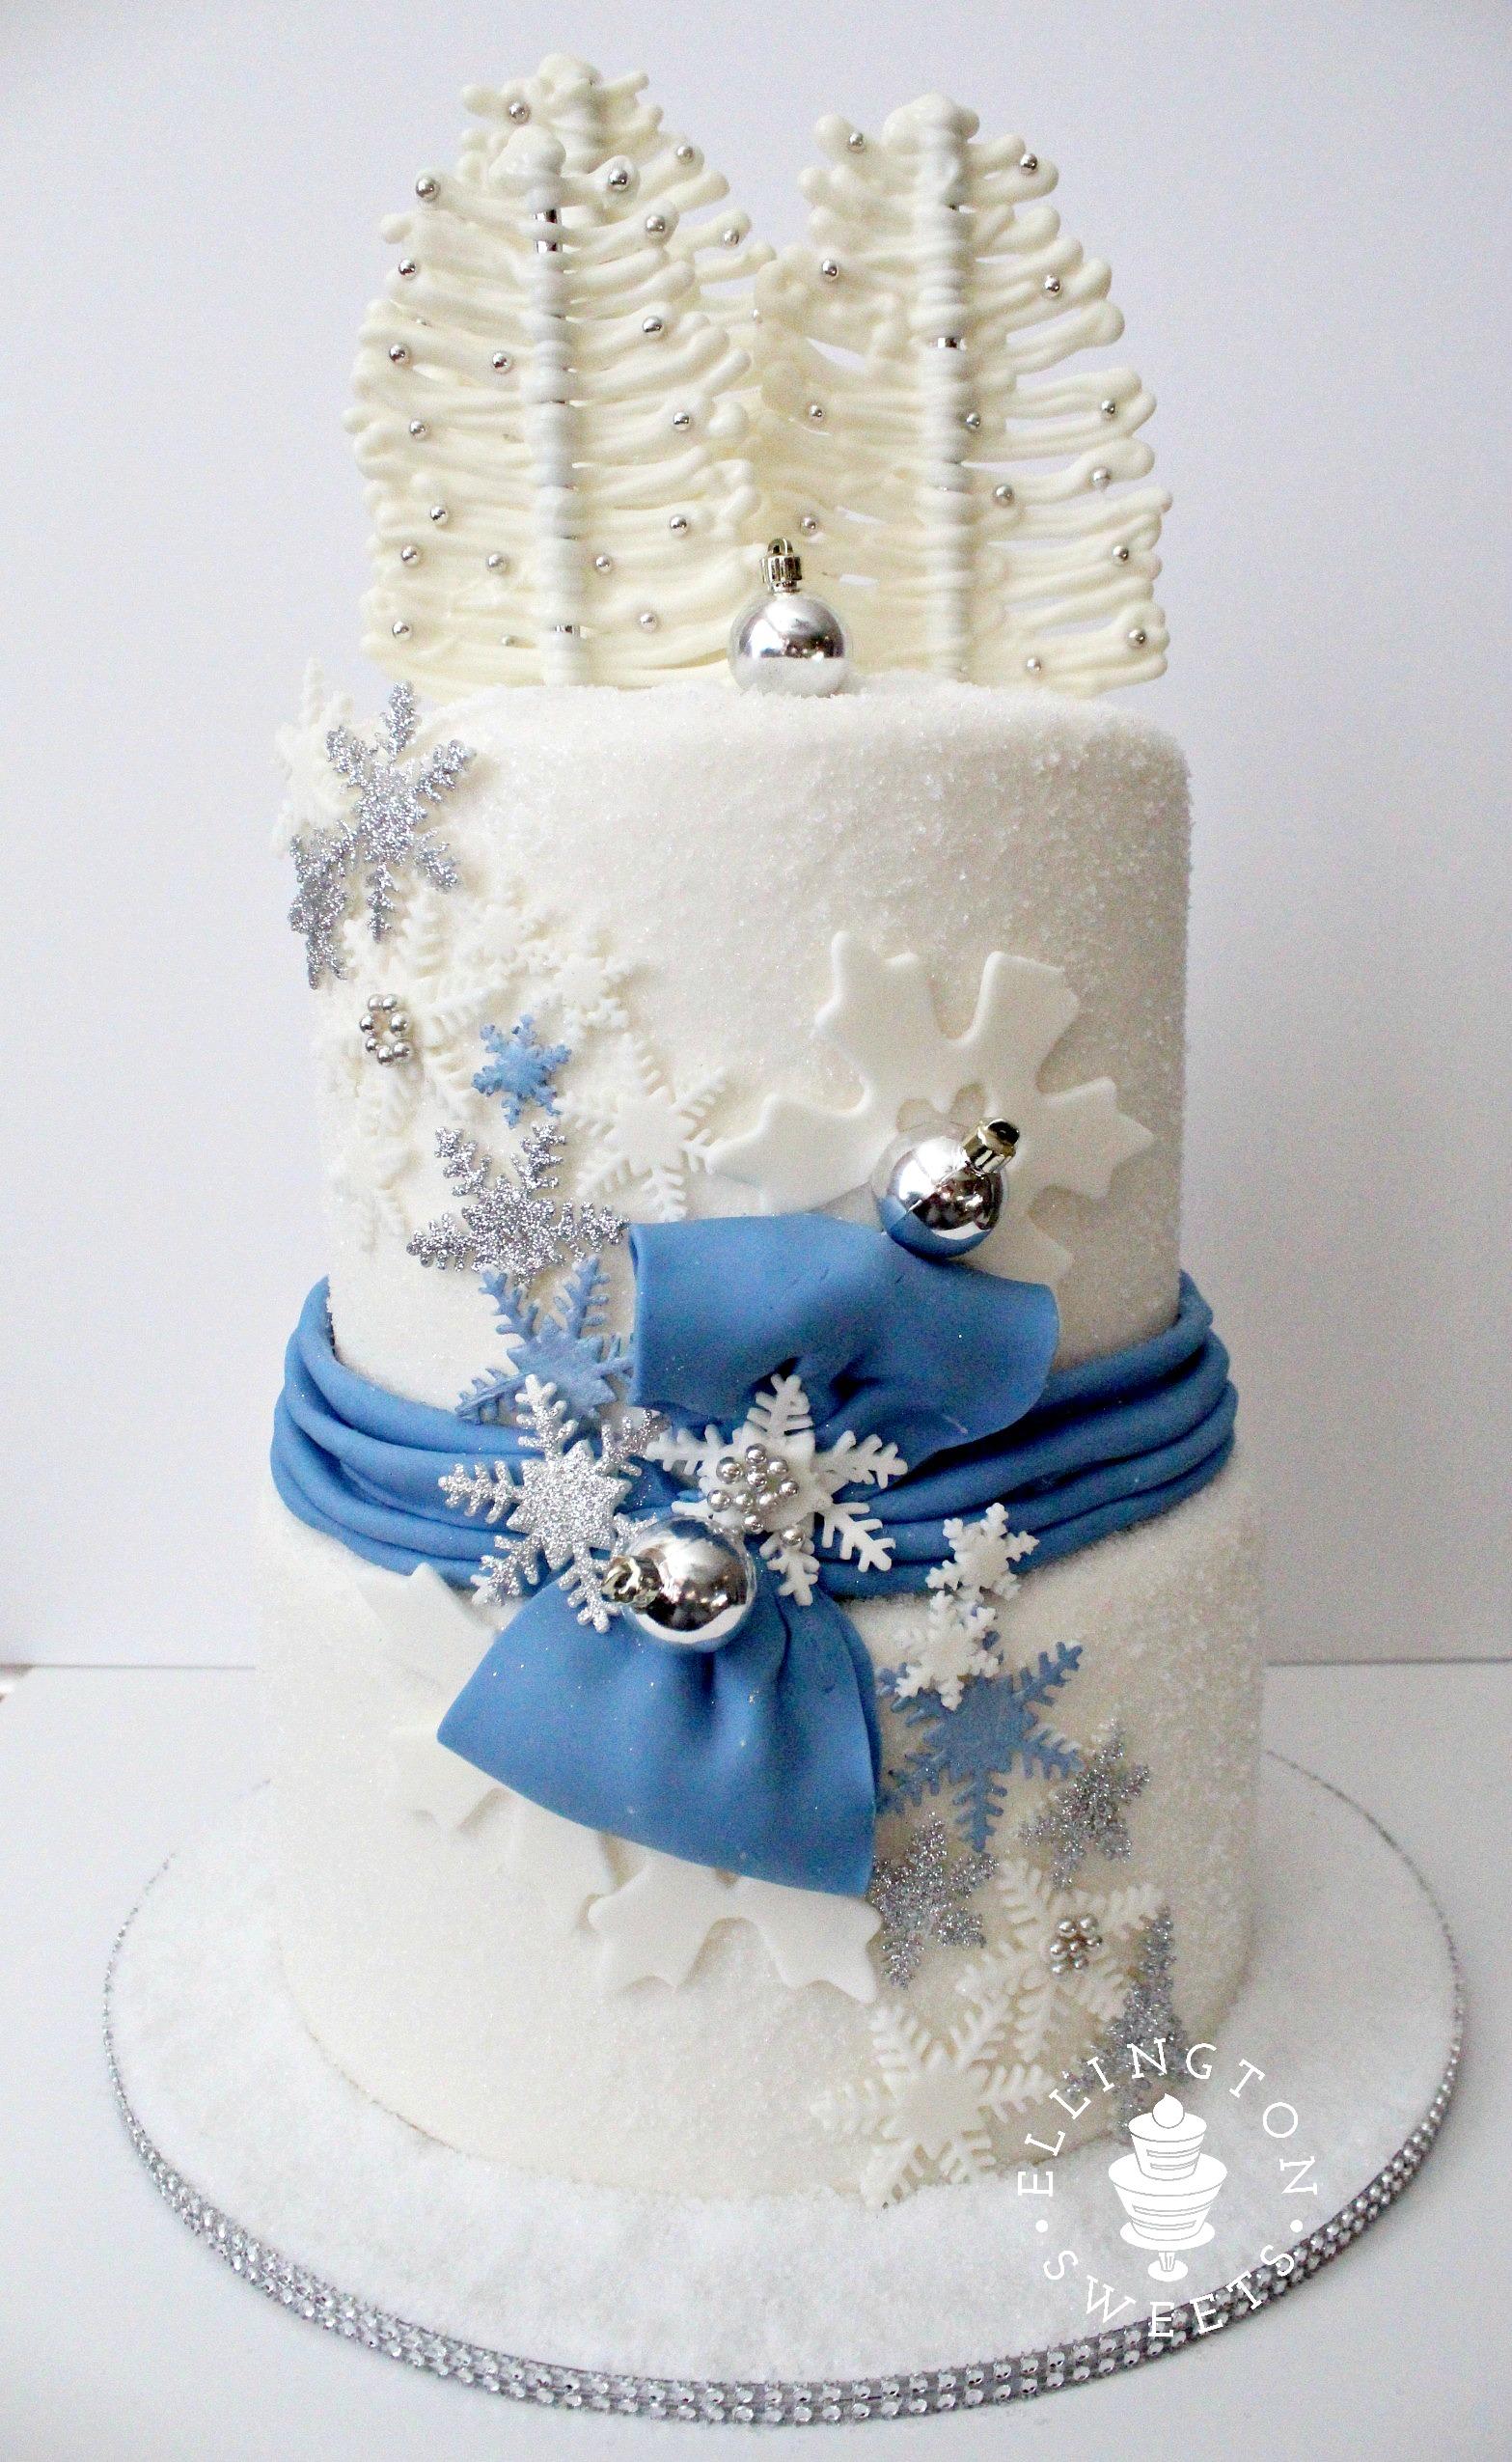 Edited Winter Wonderland Cake 2.jpg